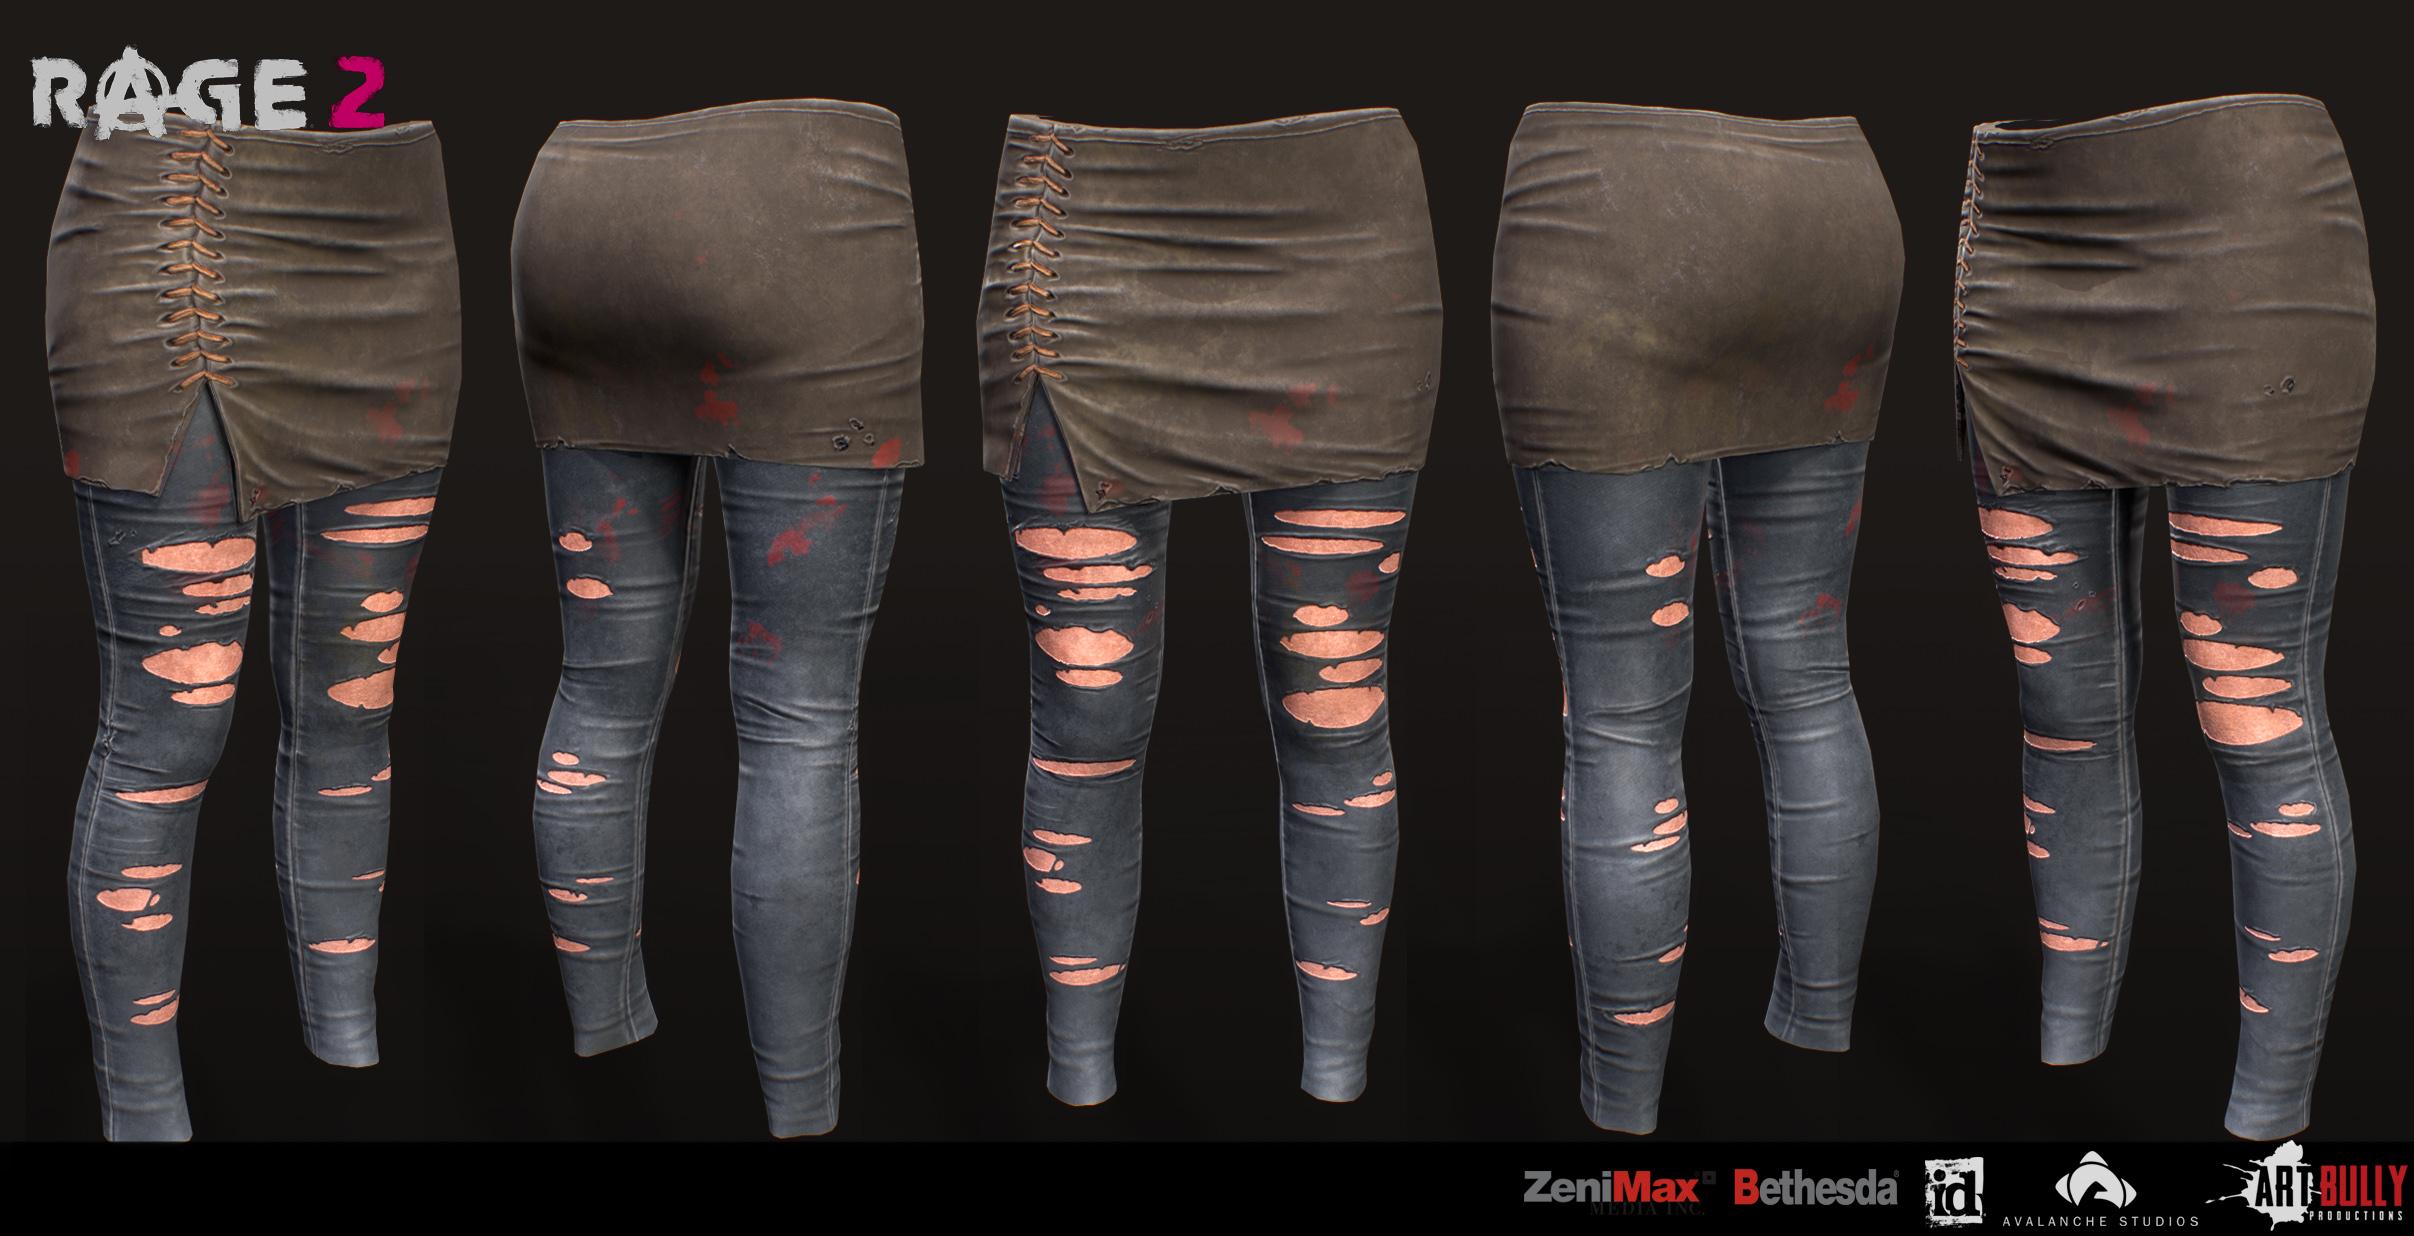 ripped_leggings.jpg